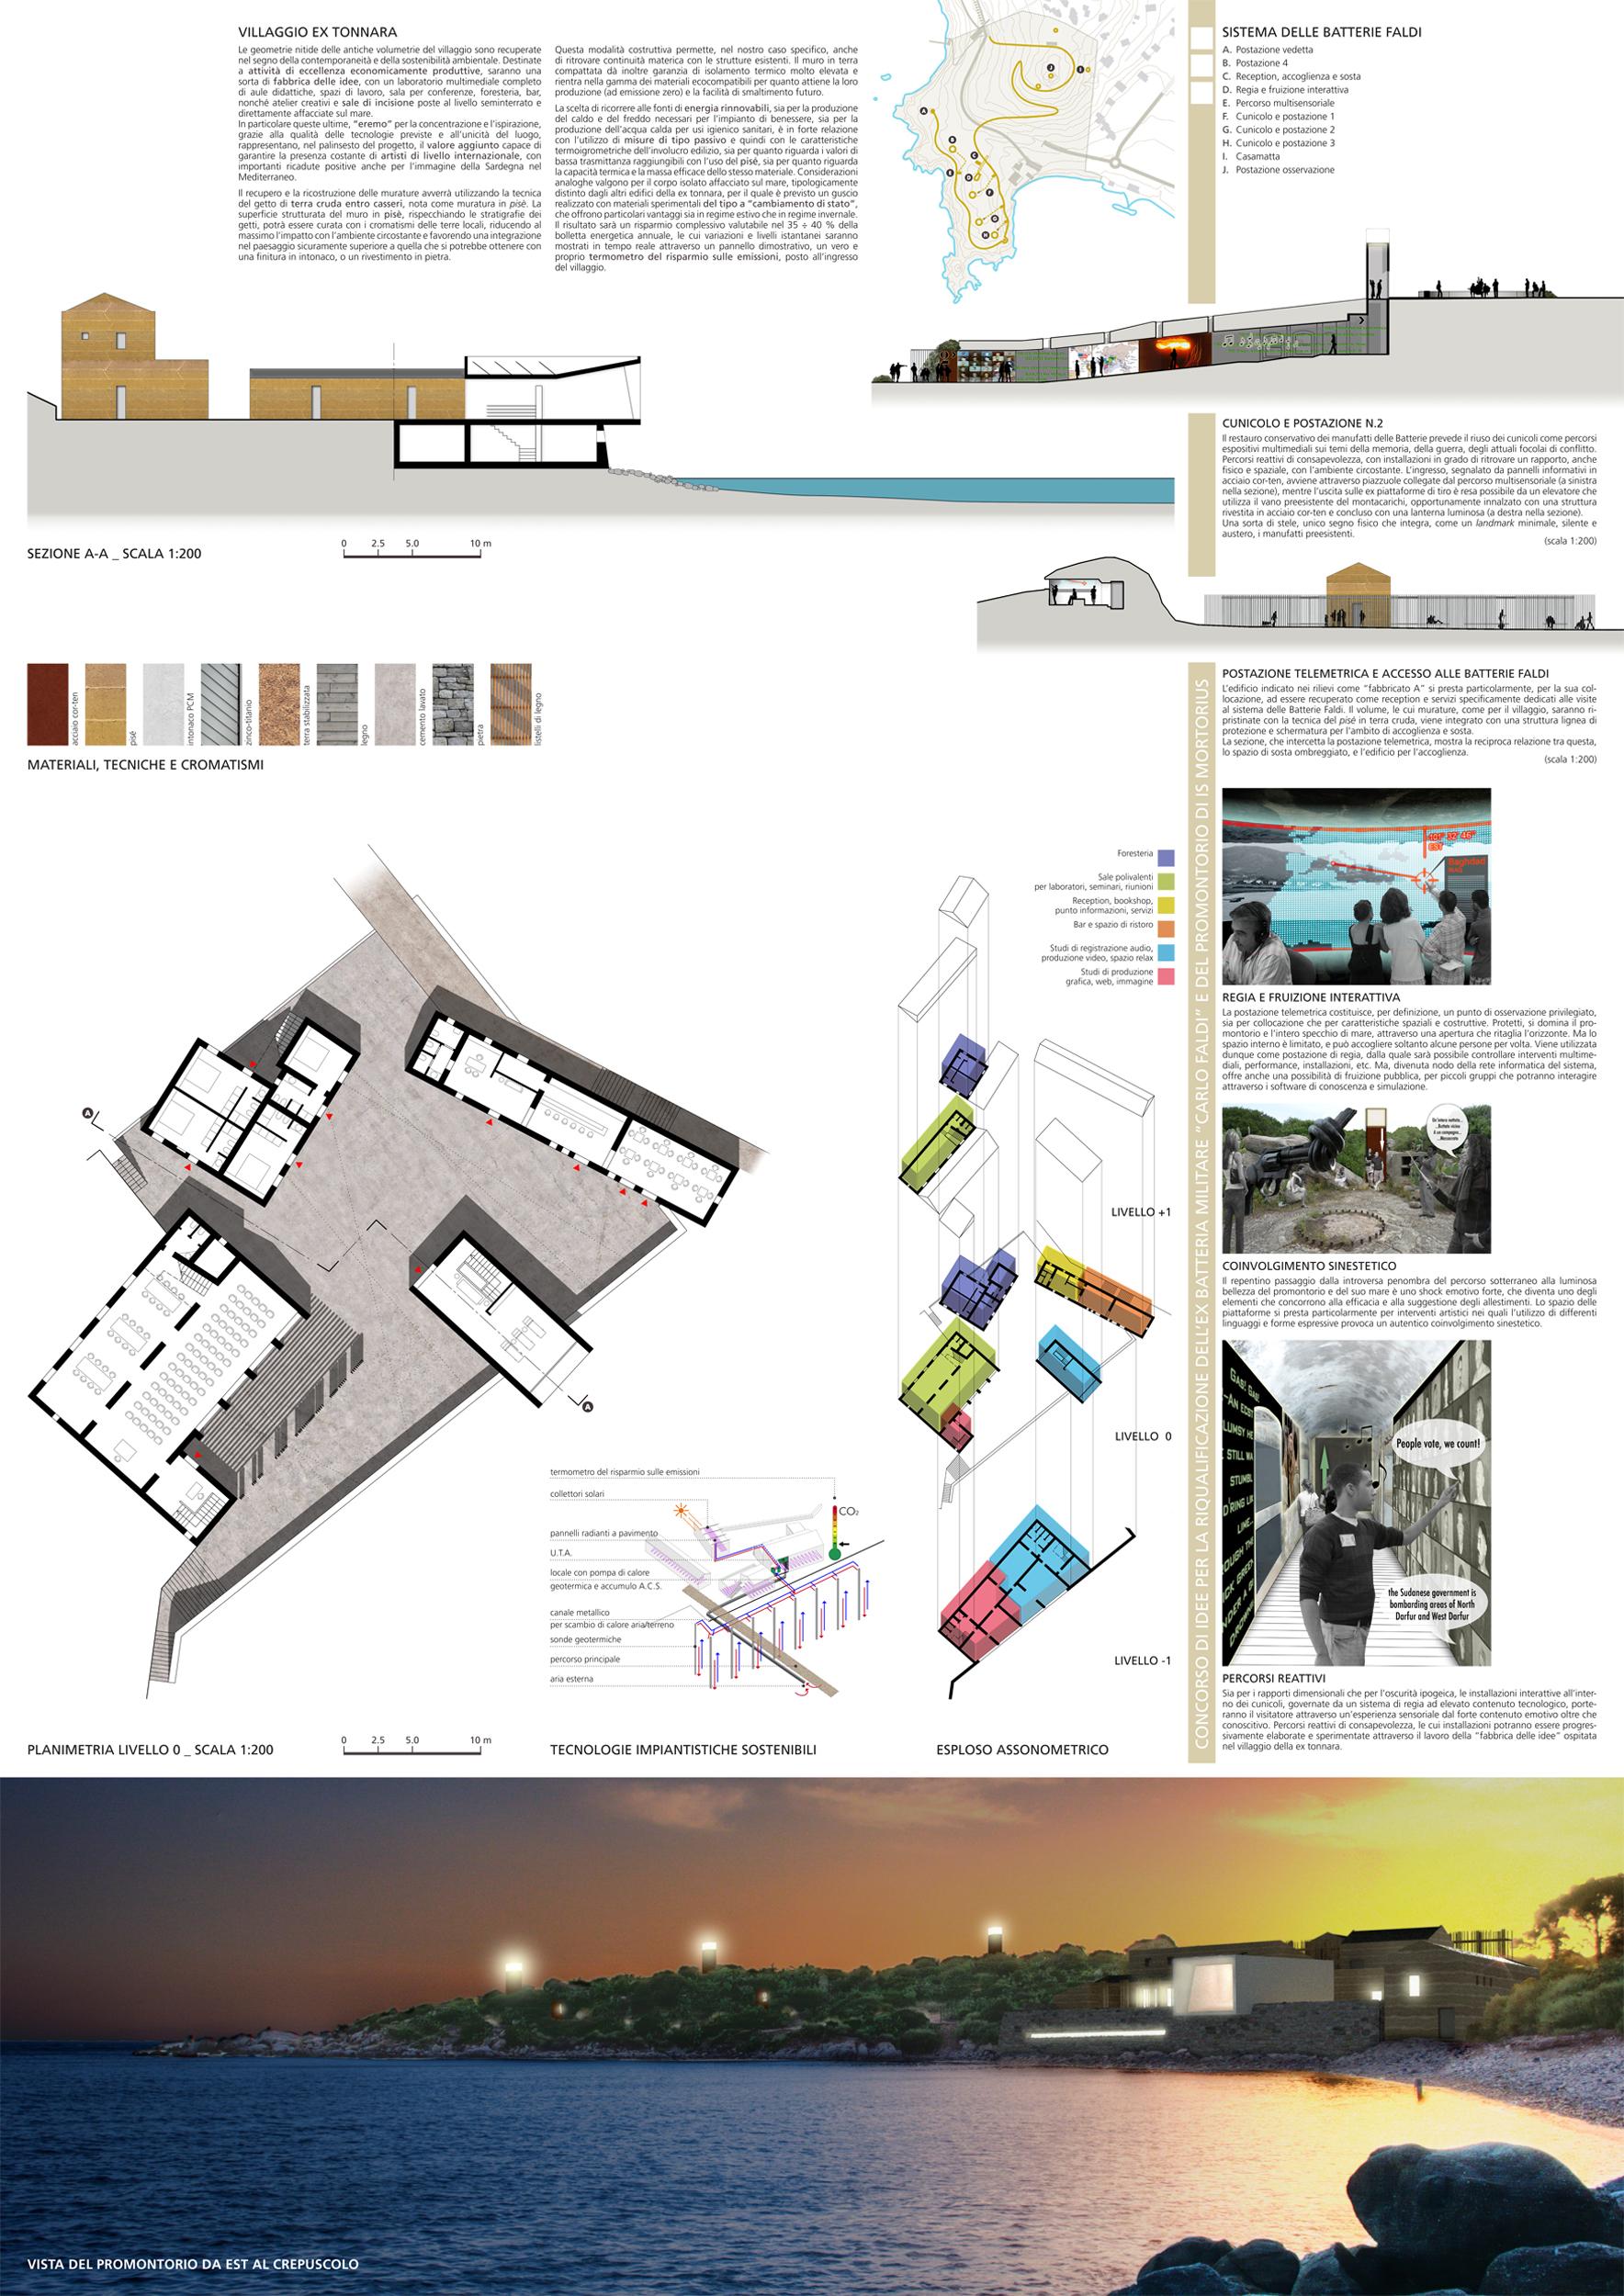 is-mortorius-fabbrica-delle-idee-tavola-3.jpg